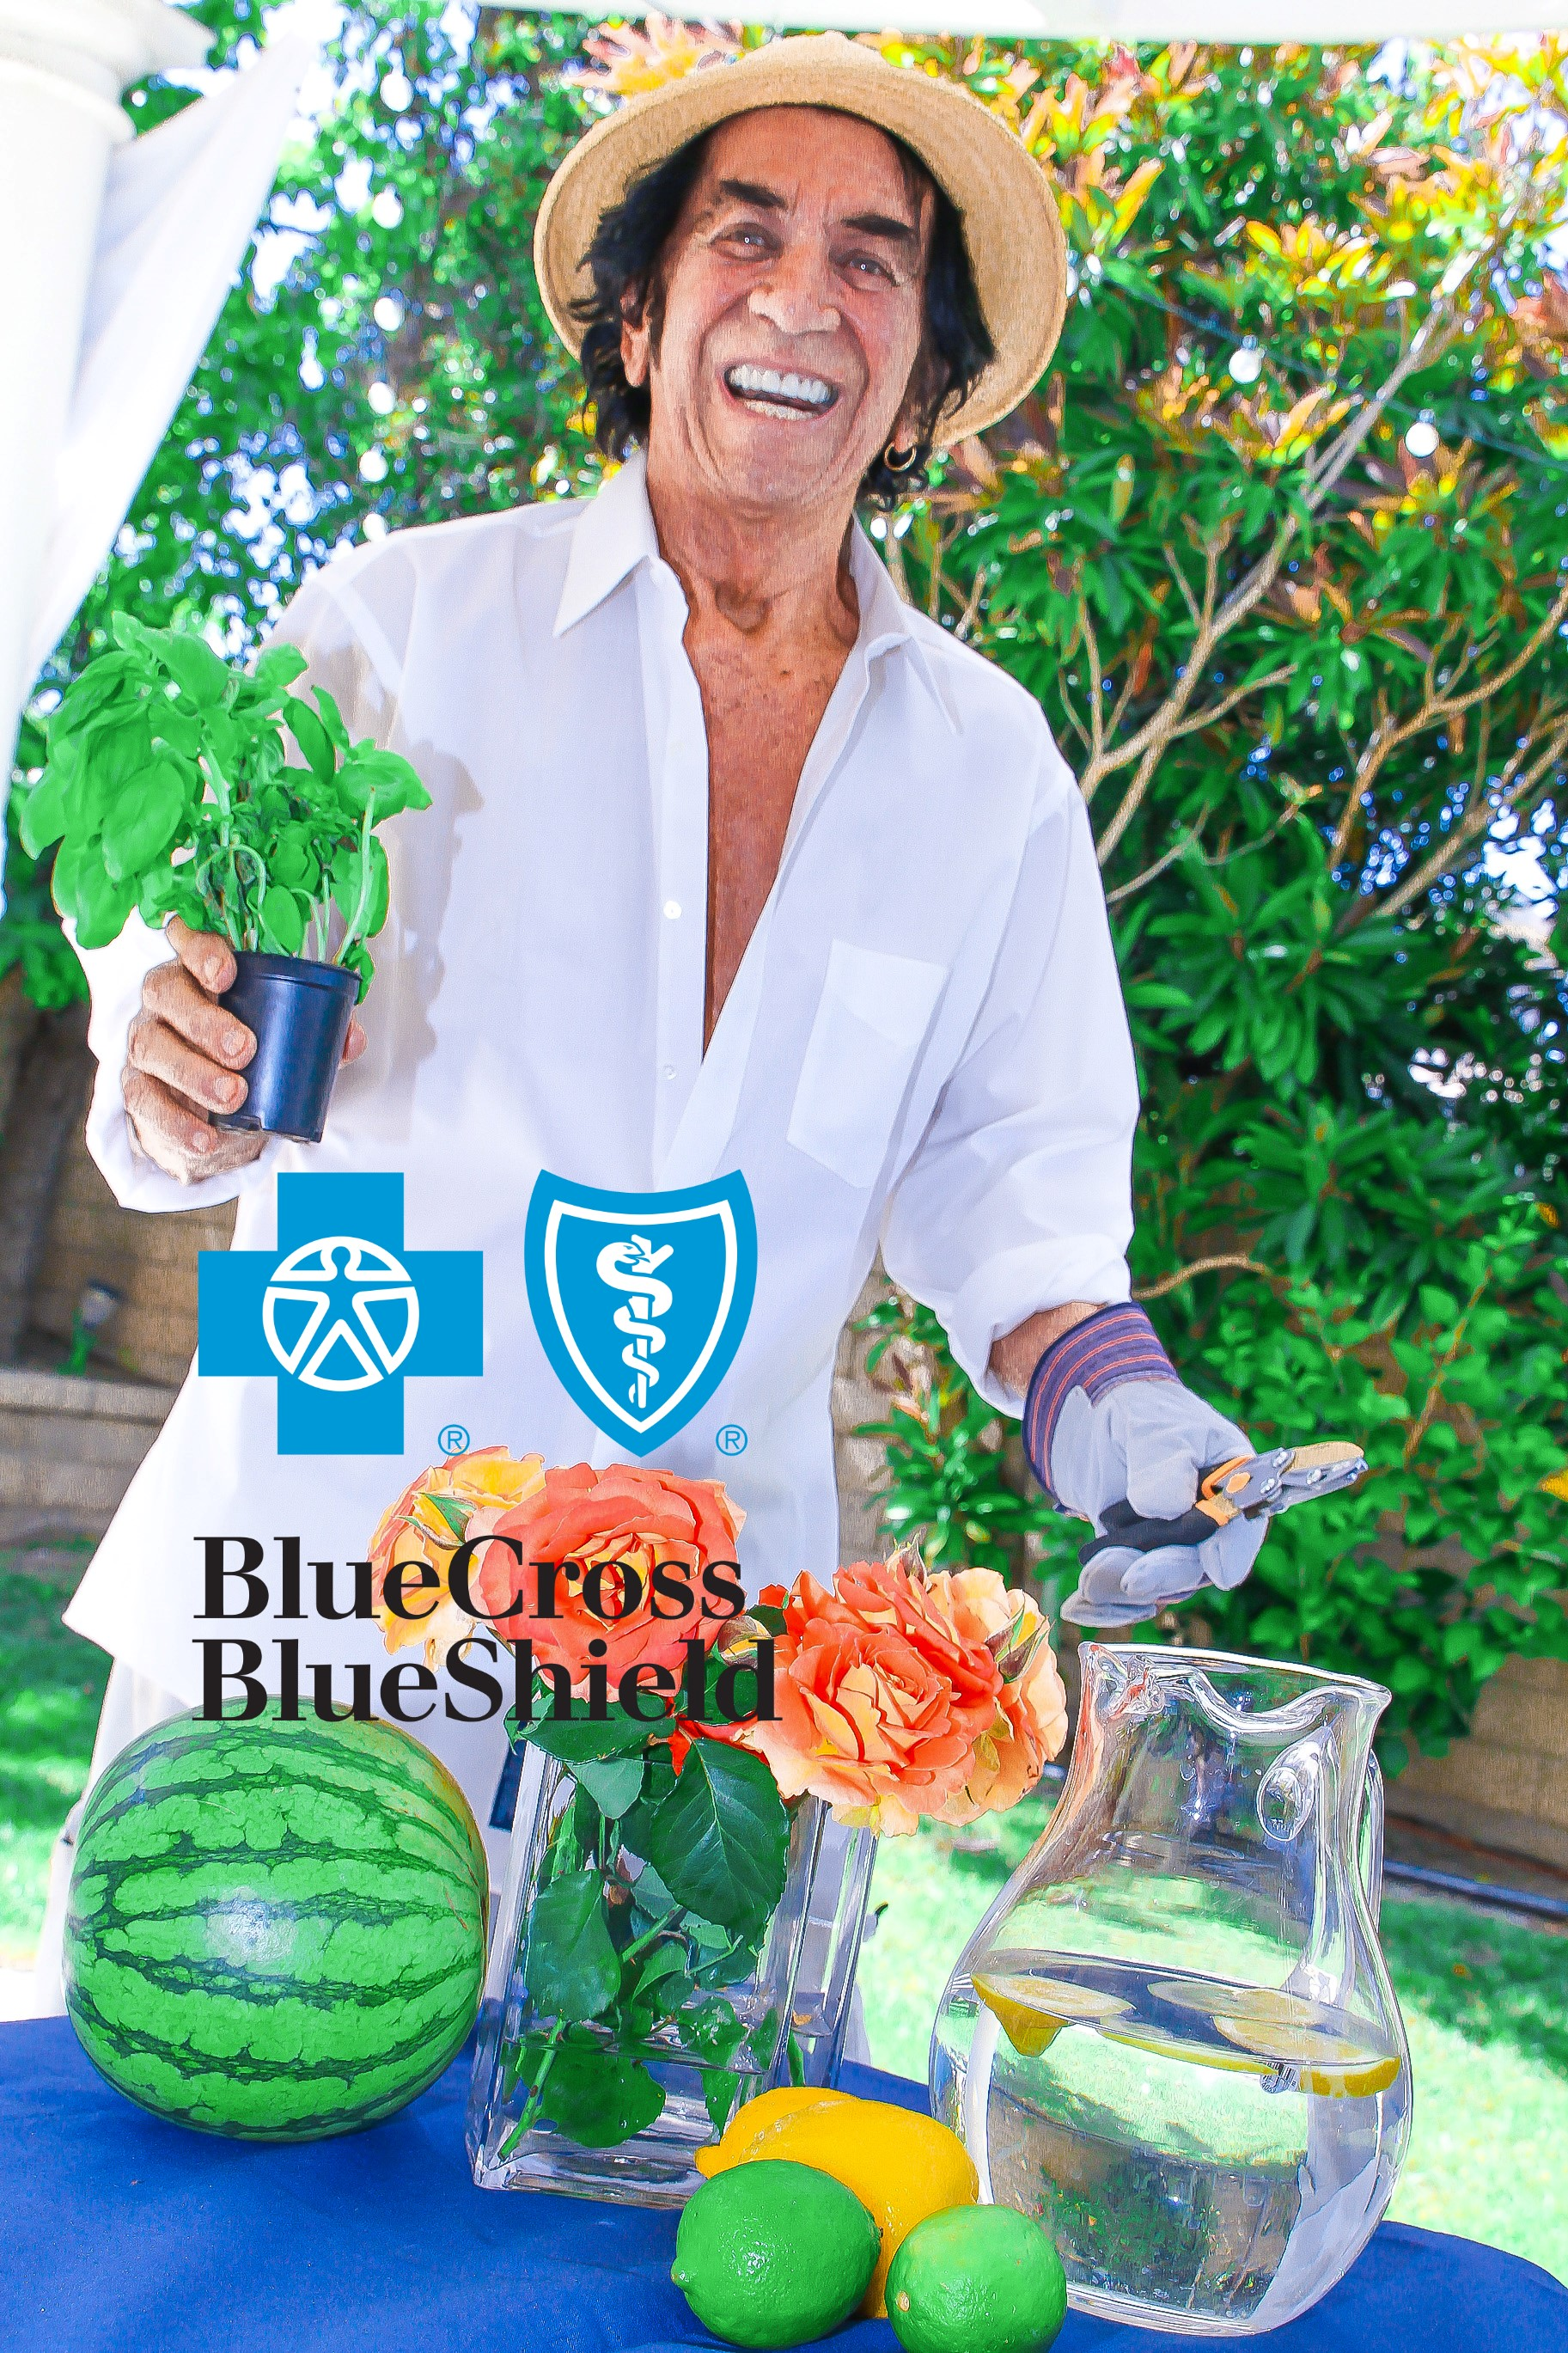 BLUE CROSS bcbs_montage SAMPLE 1